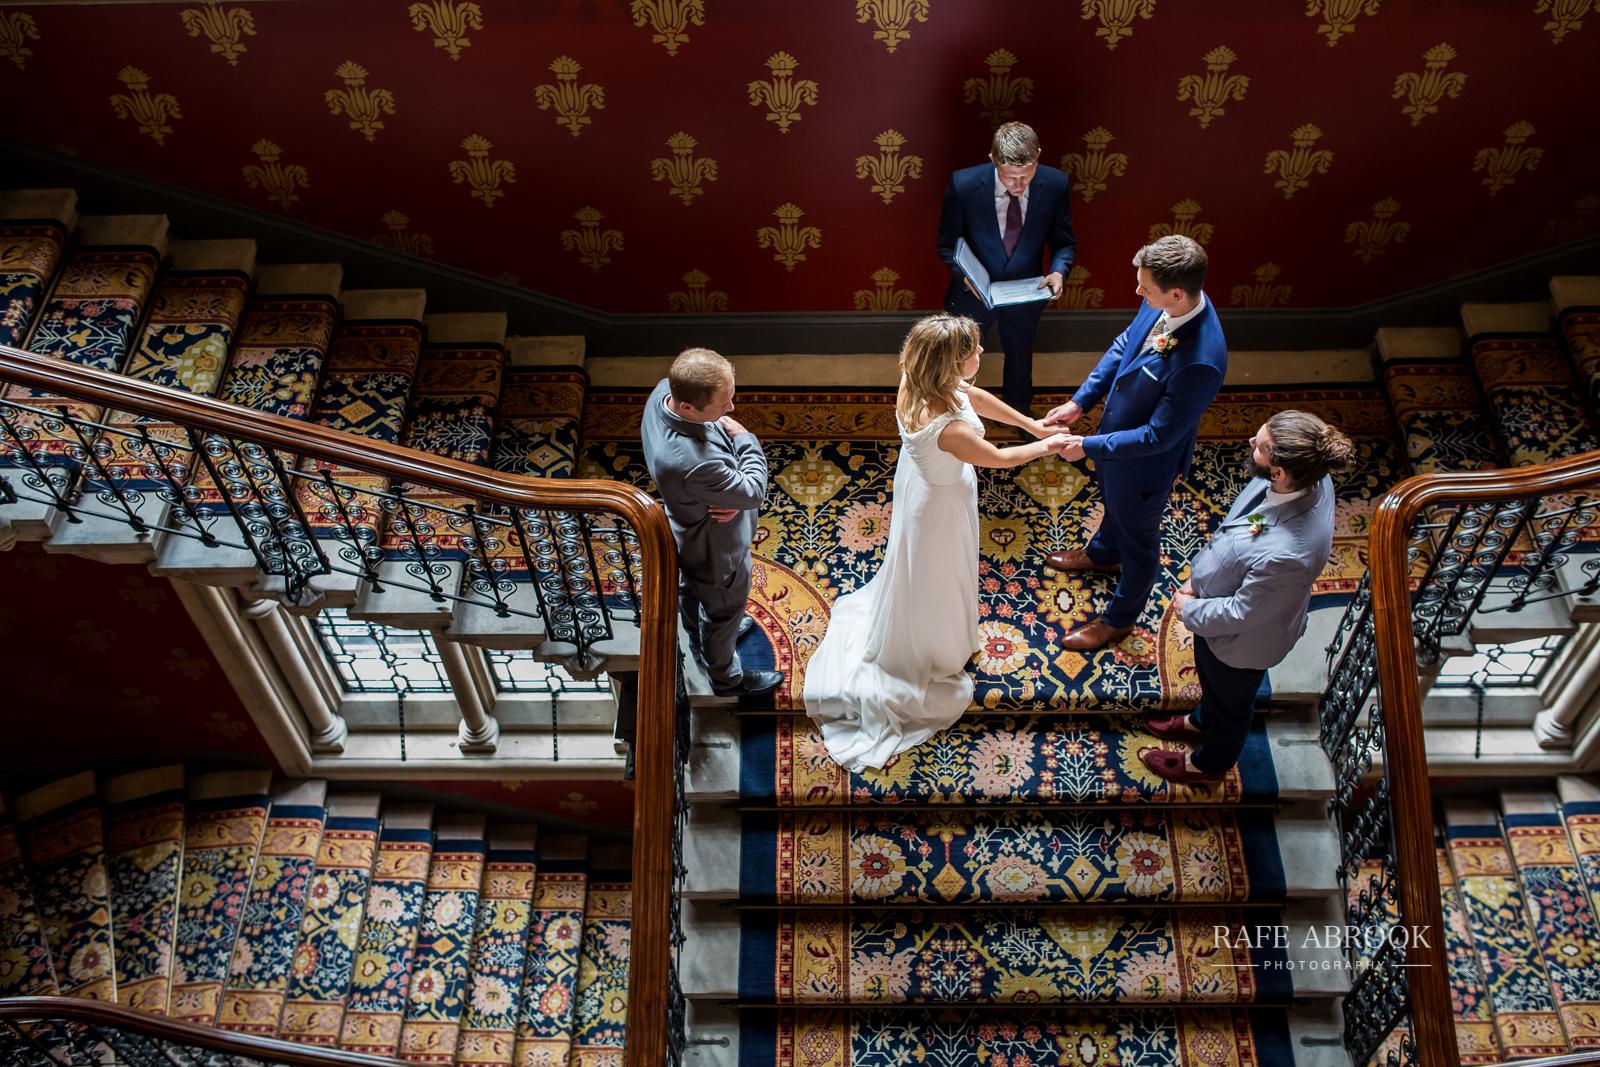 wedding photographer hertfordshire london st pancras renaissance hotel station grand staircase-1084.jpg